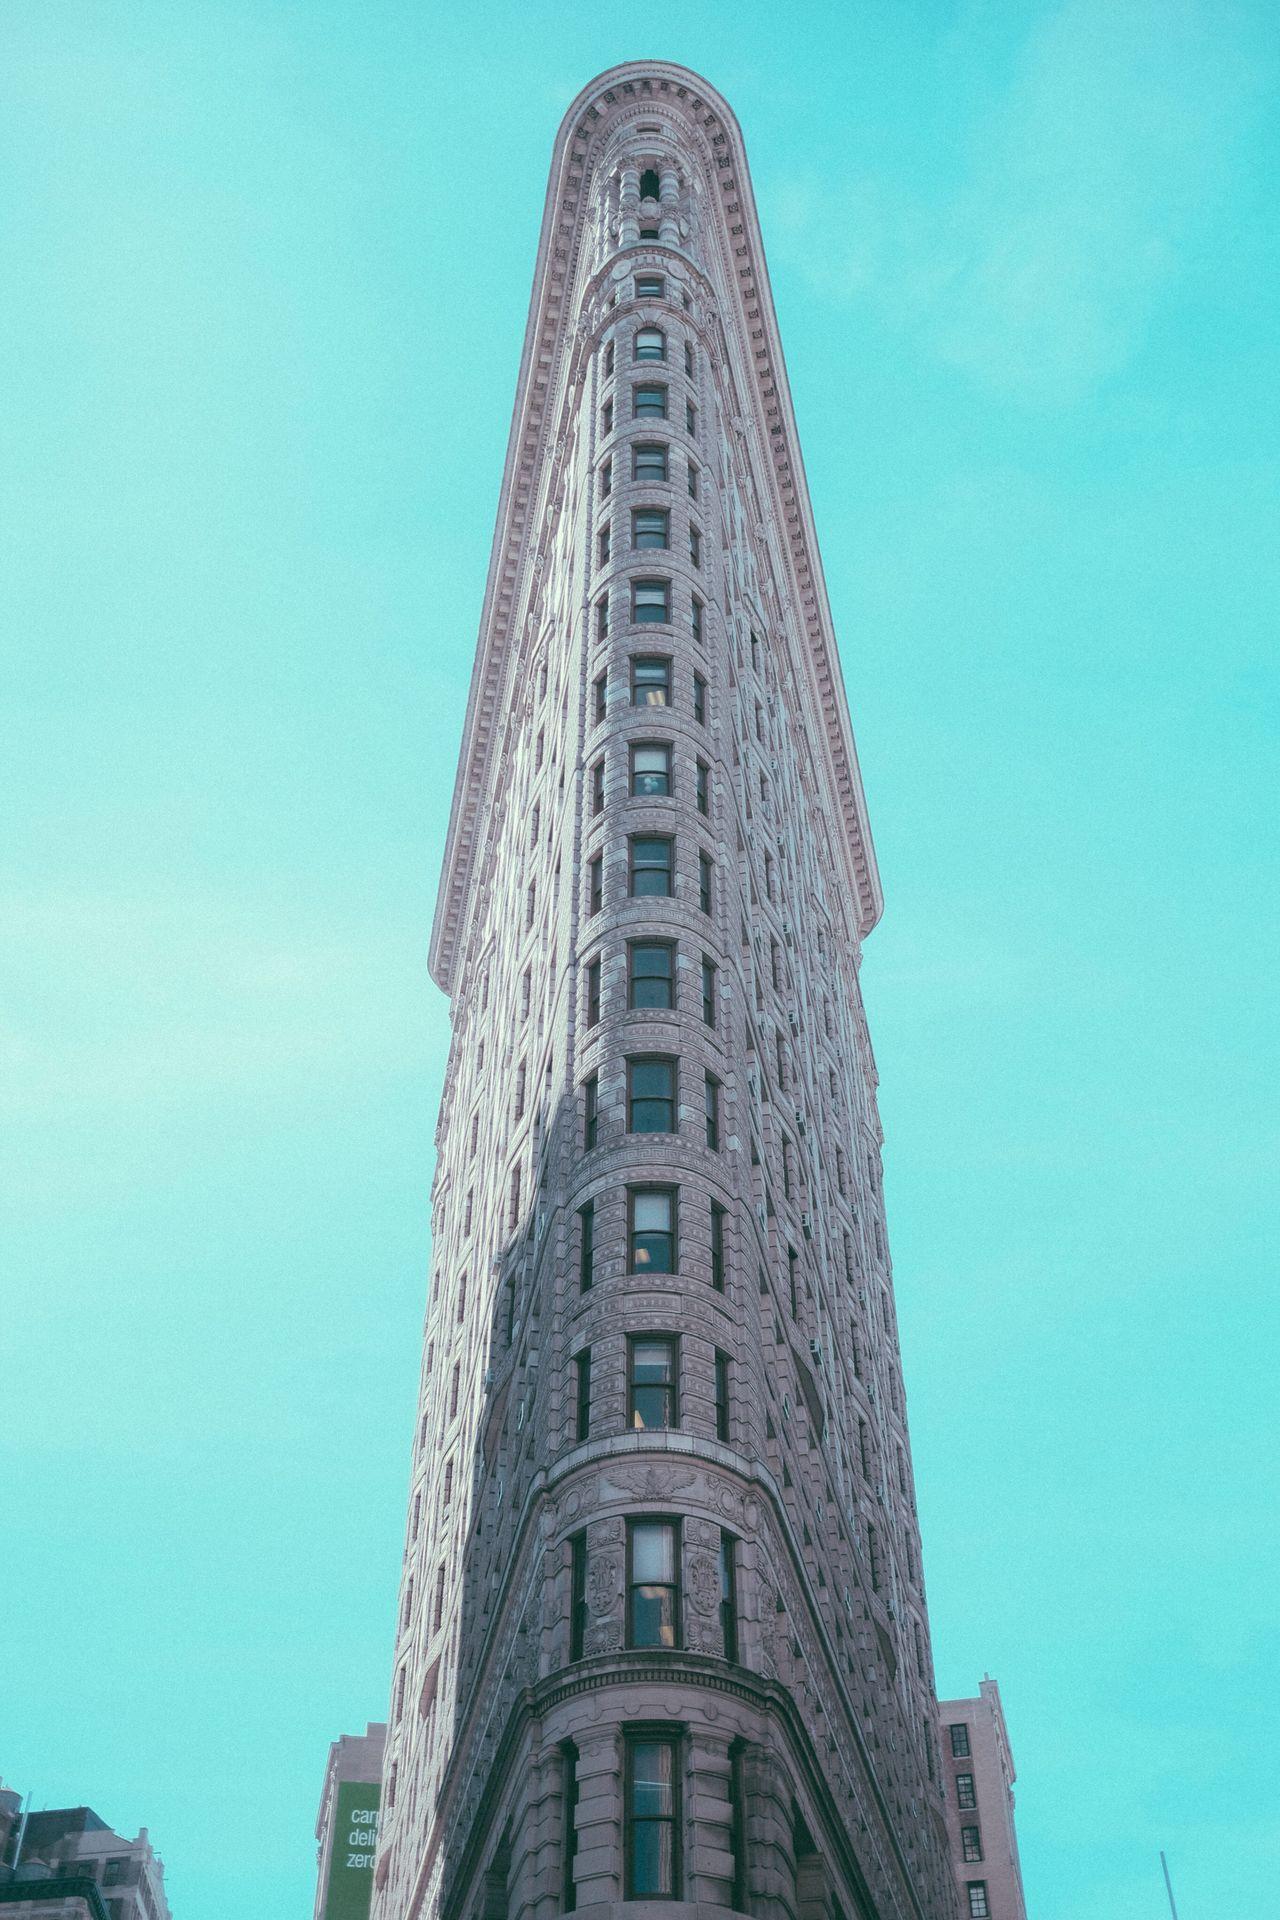 Iconic Flatiron Flatiron Building New York VSCO